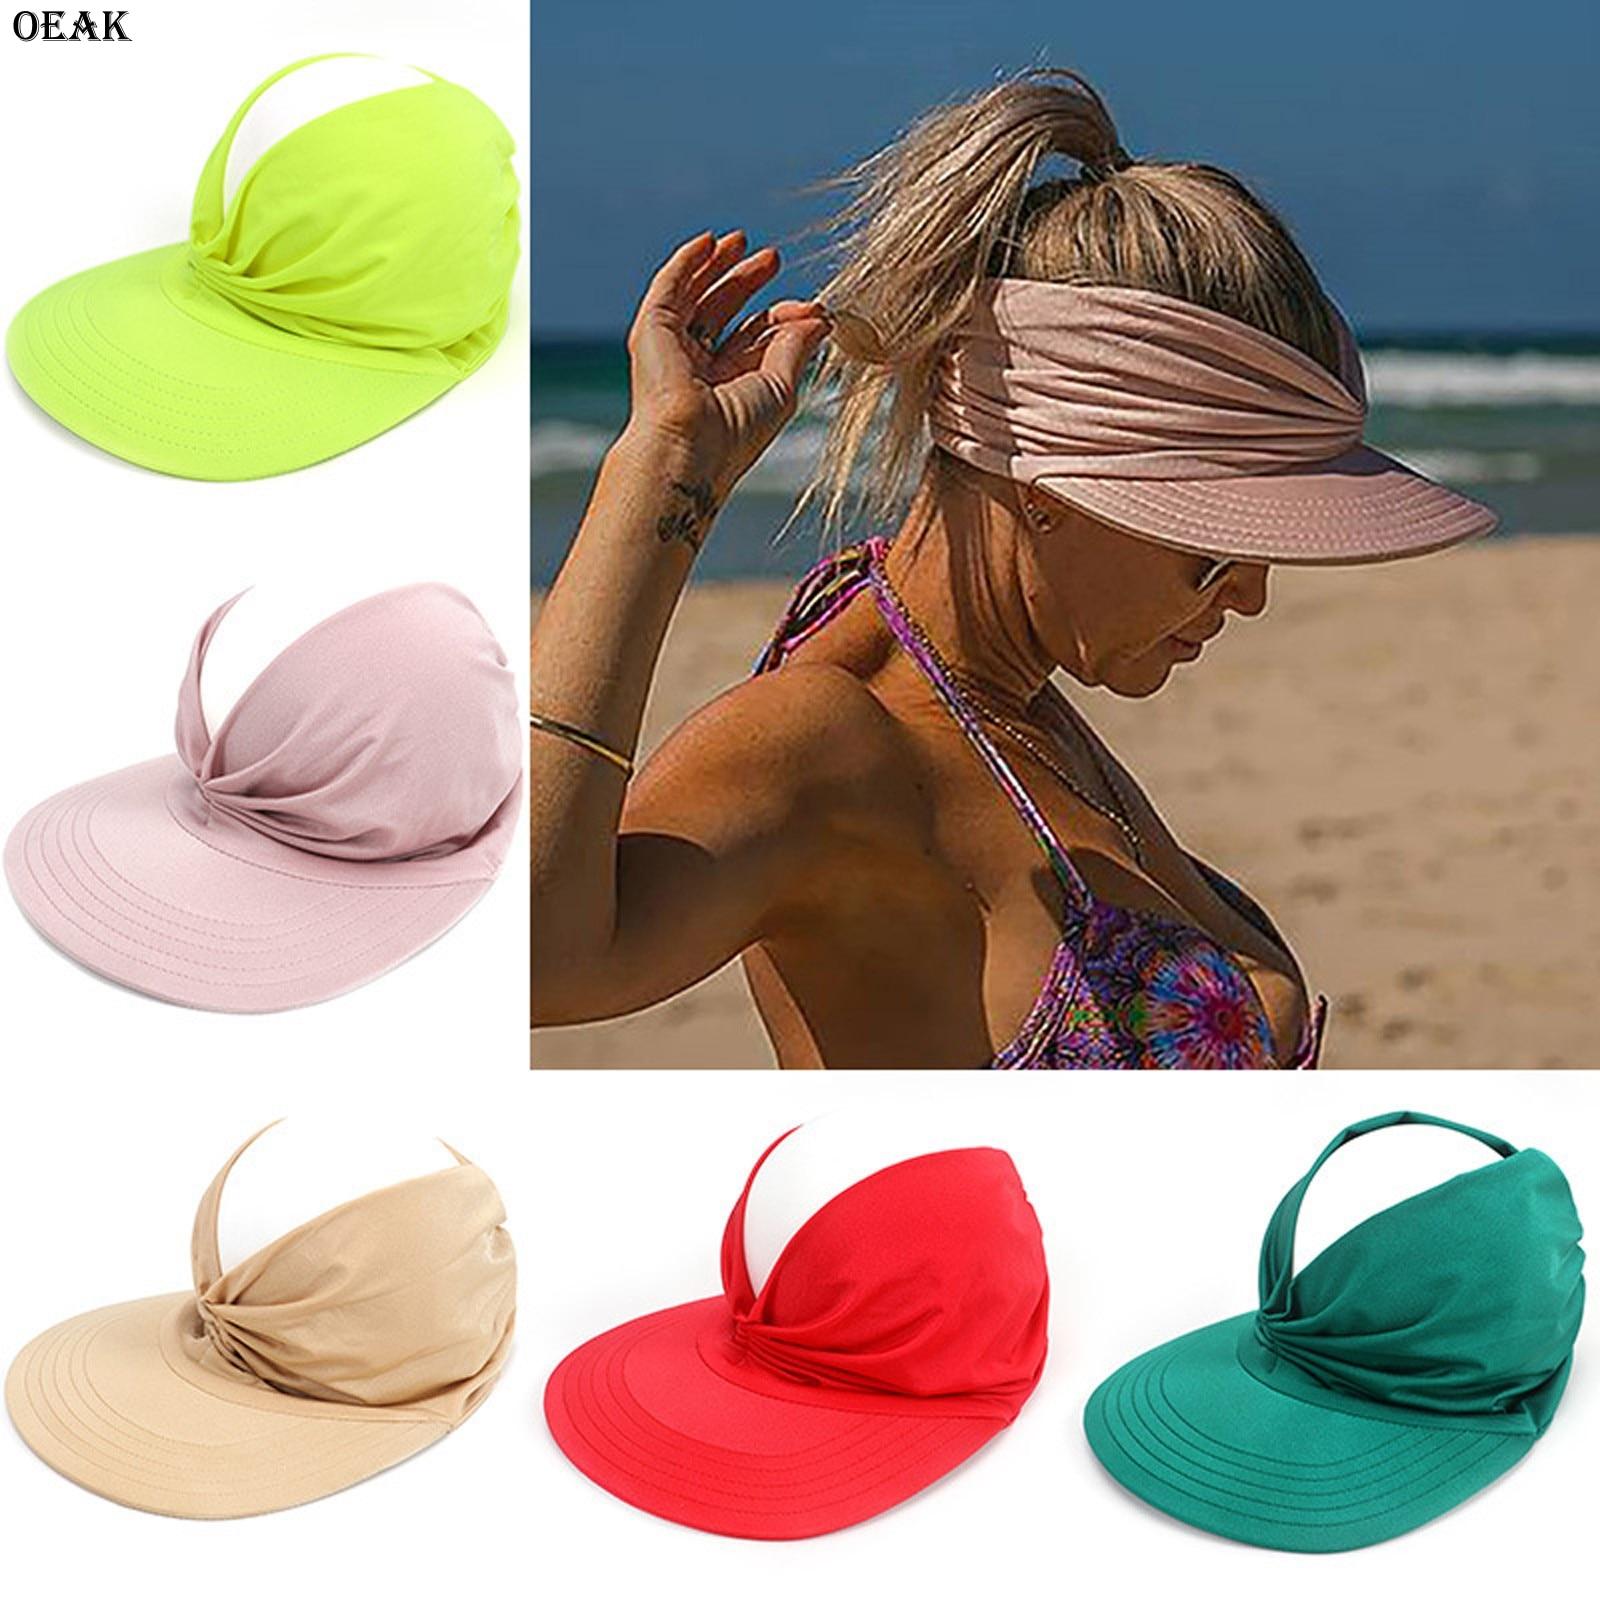 OEAK New Arrival Summer Hat Women's Sun Visor Sun Hat Anti-ultraviolet Elastic Hollow Top Hat New Casual Caps Gorras